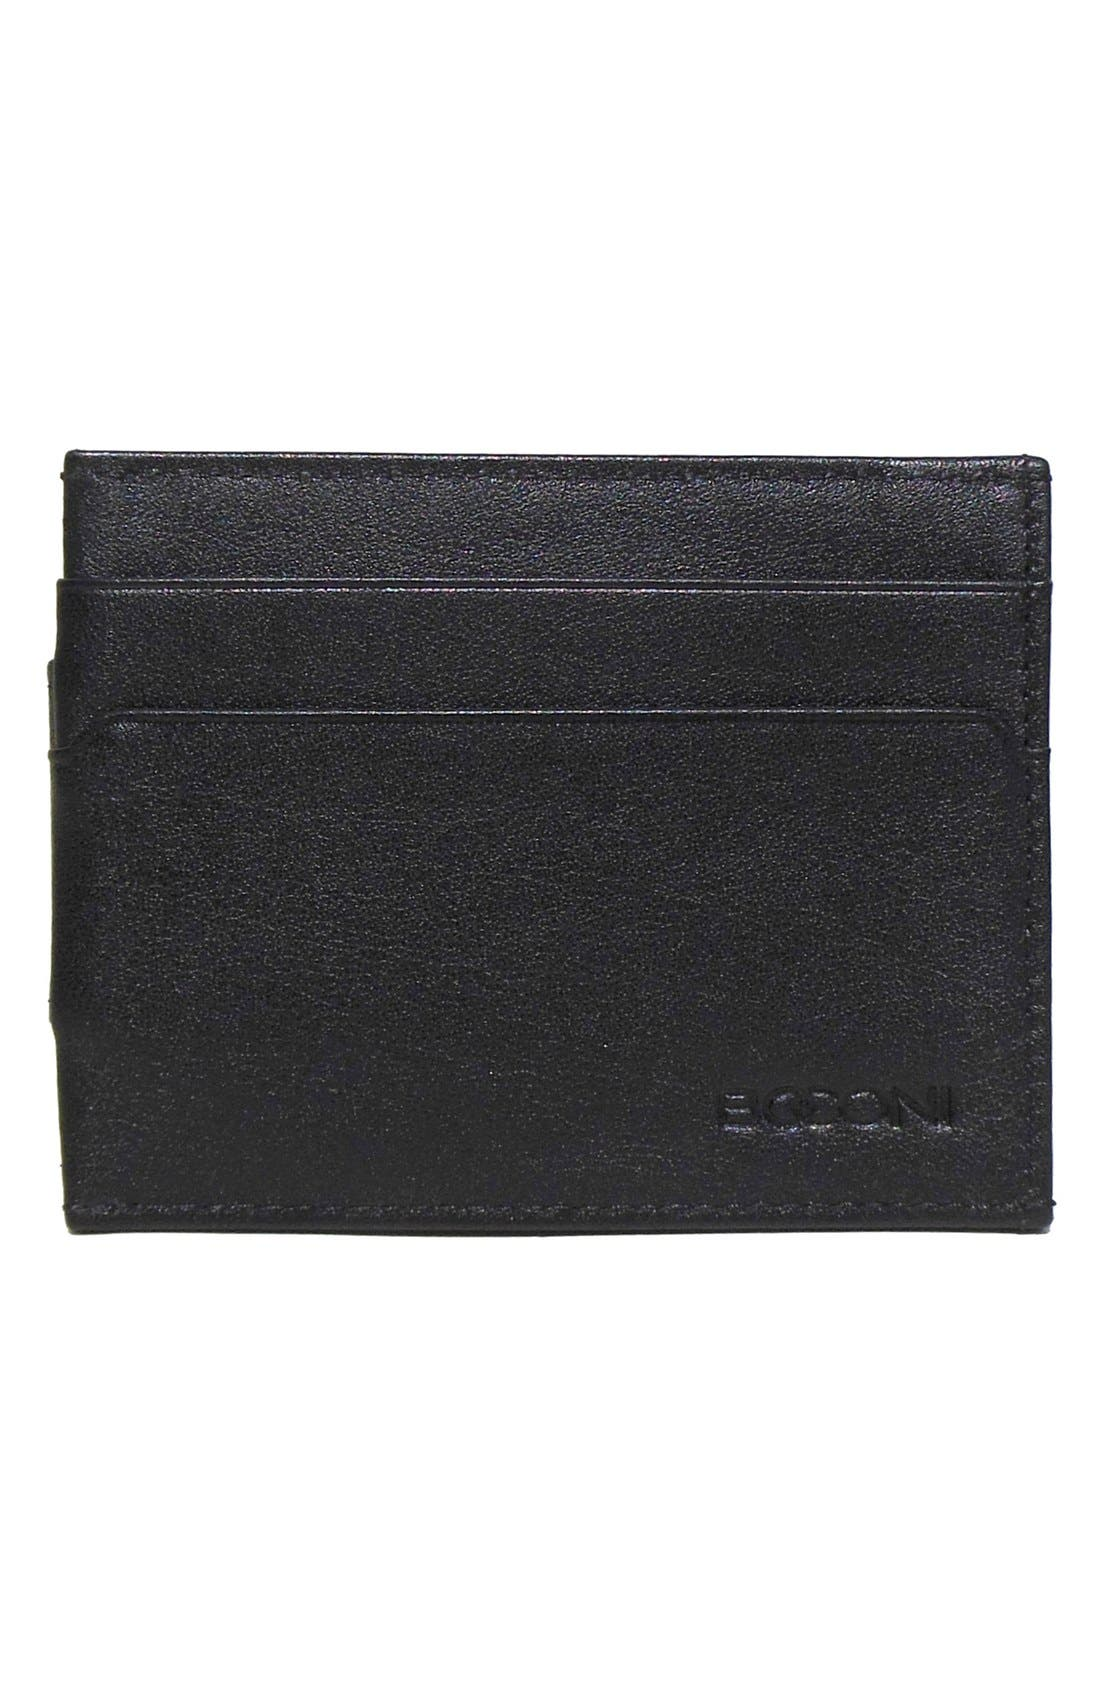 'Grant' Money Clip Card Case,                             Main thumbnail 1, color,                             BLACK/ GREY